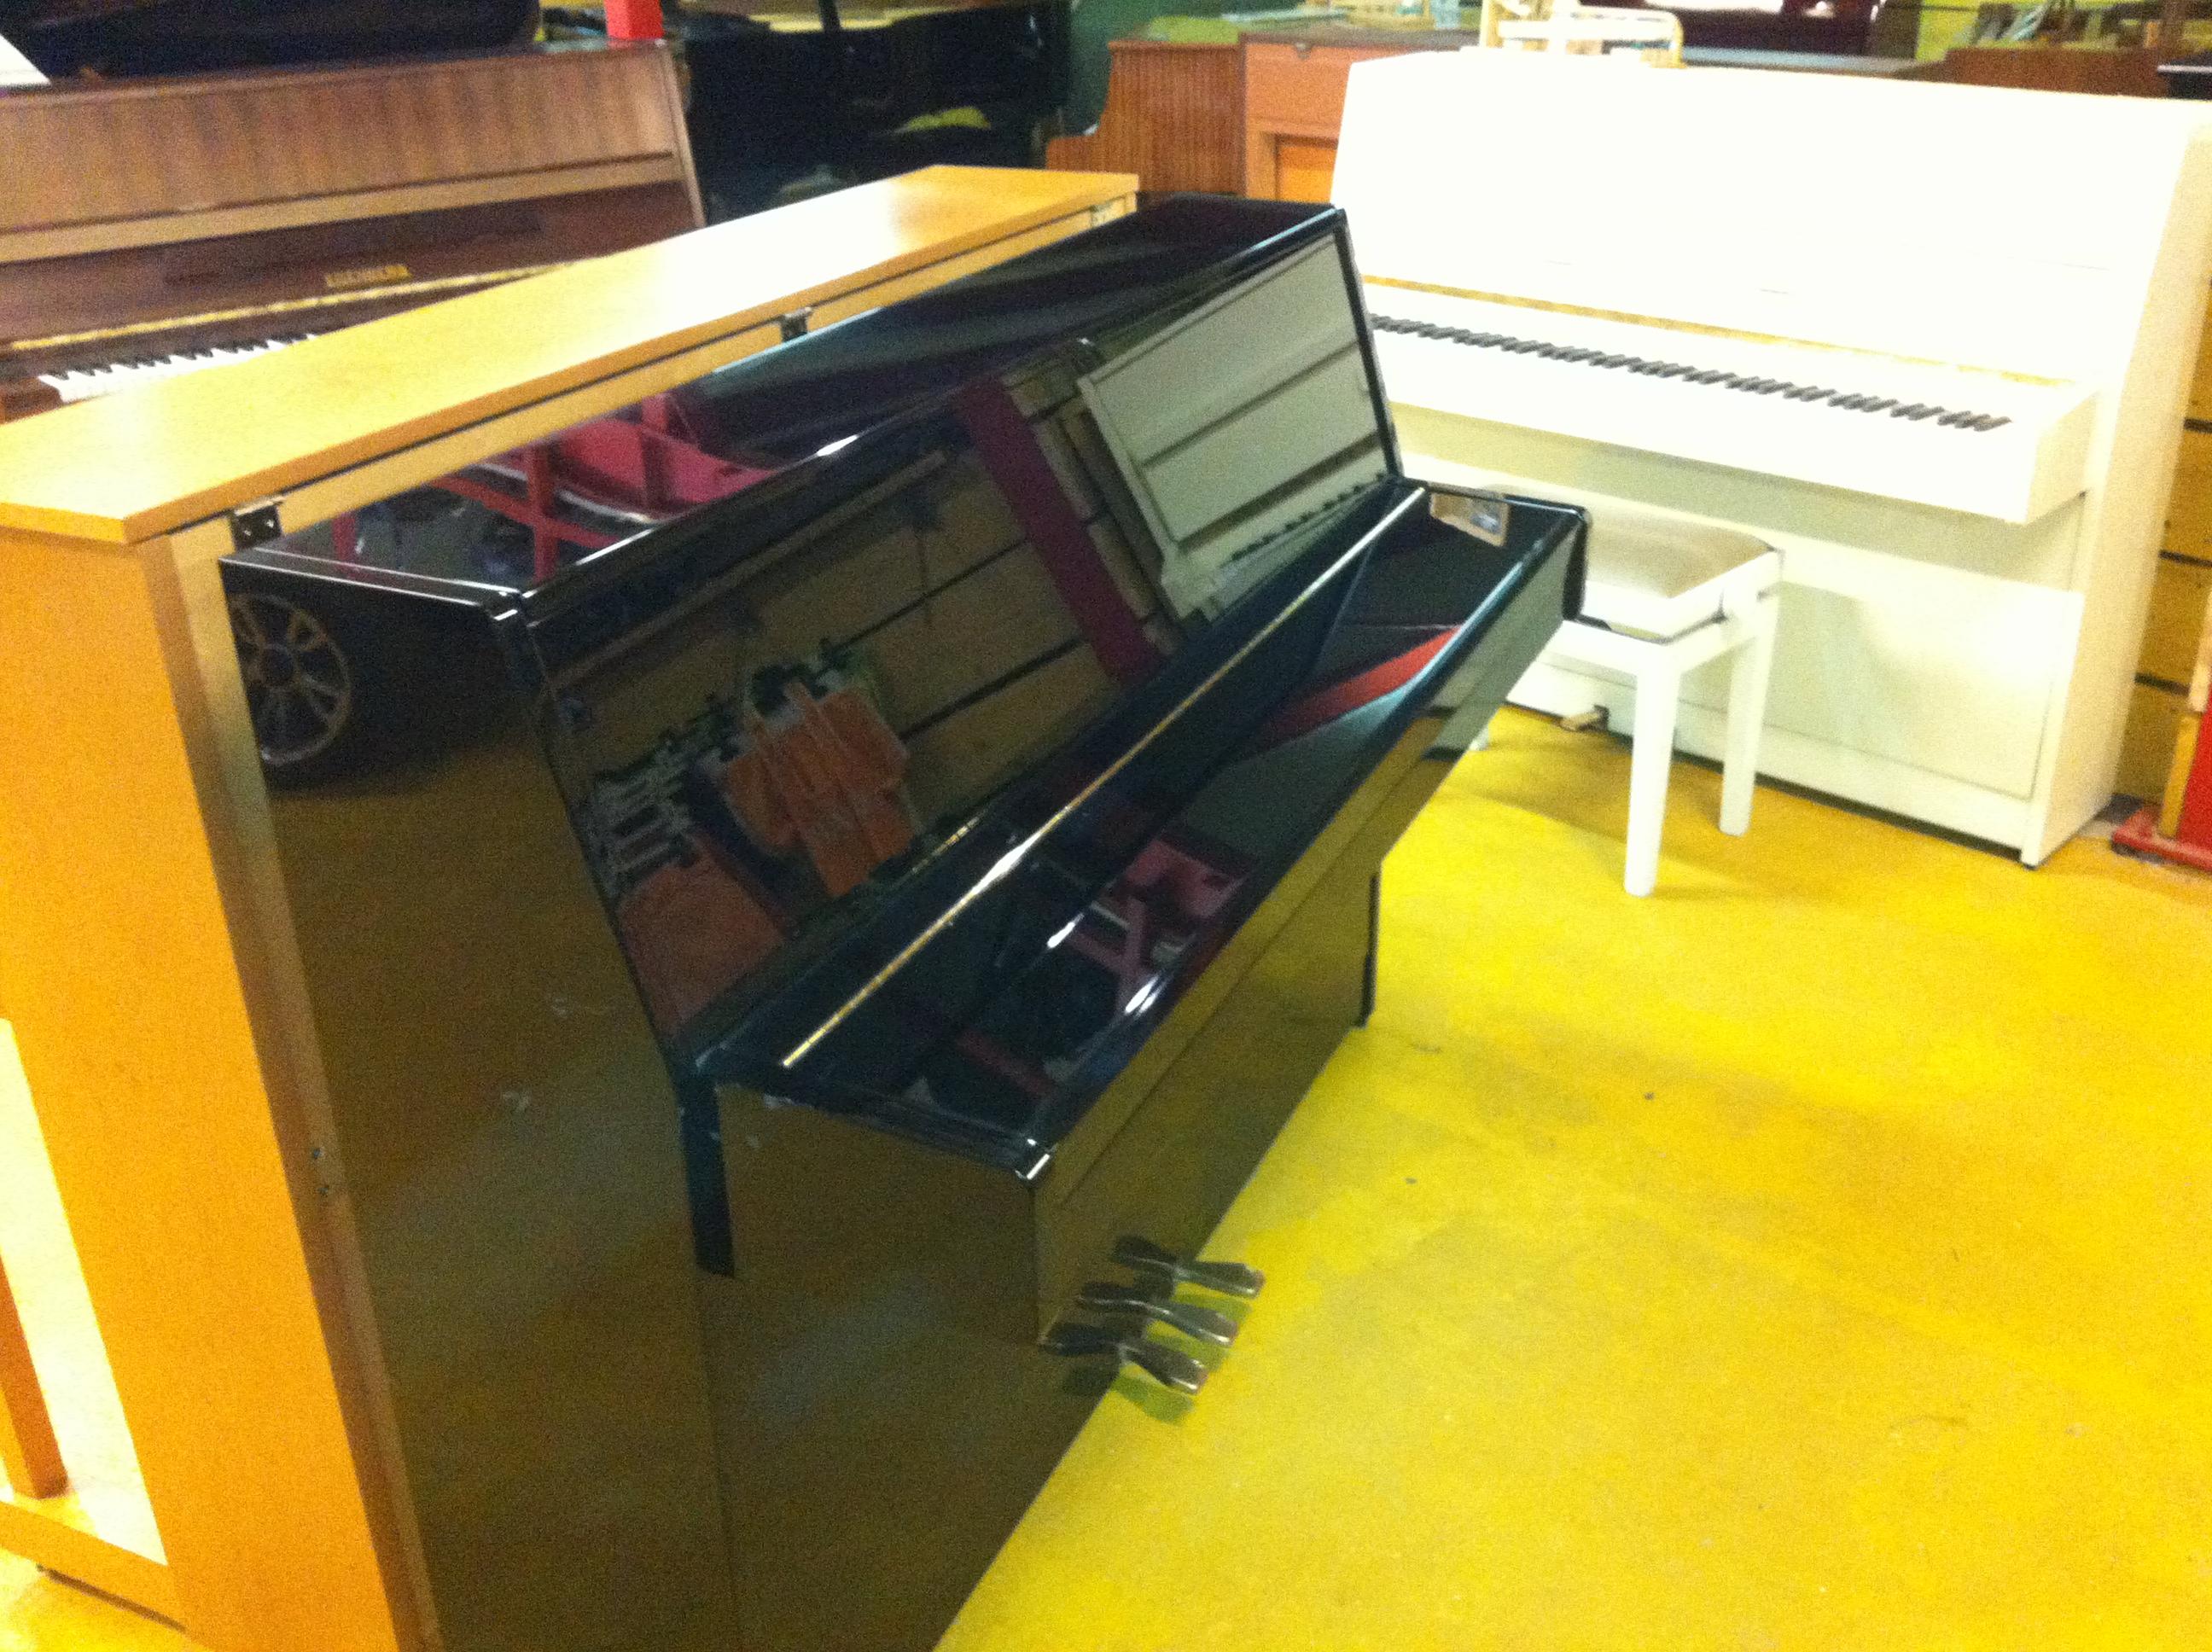 piano prix discount occasion accord pianos lorraine. Black Bedroom Furniture Sets. Home Design Ideas